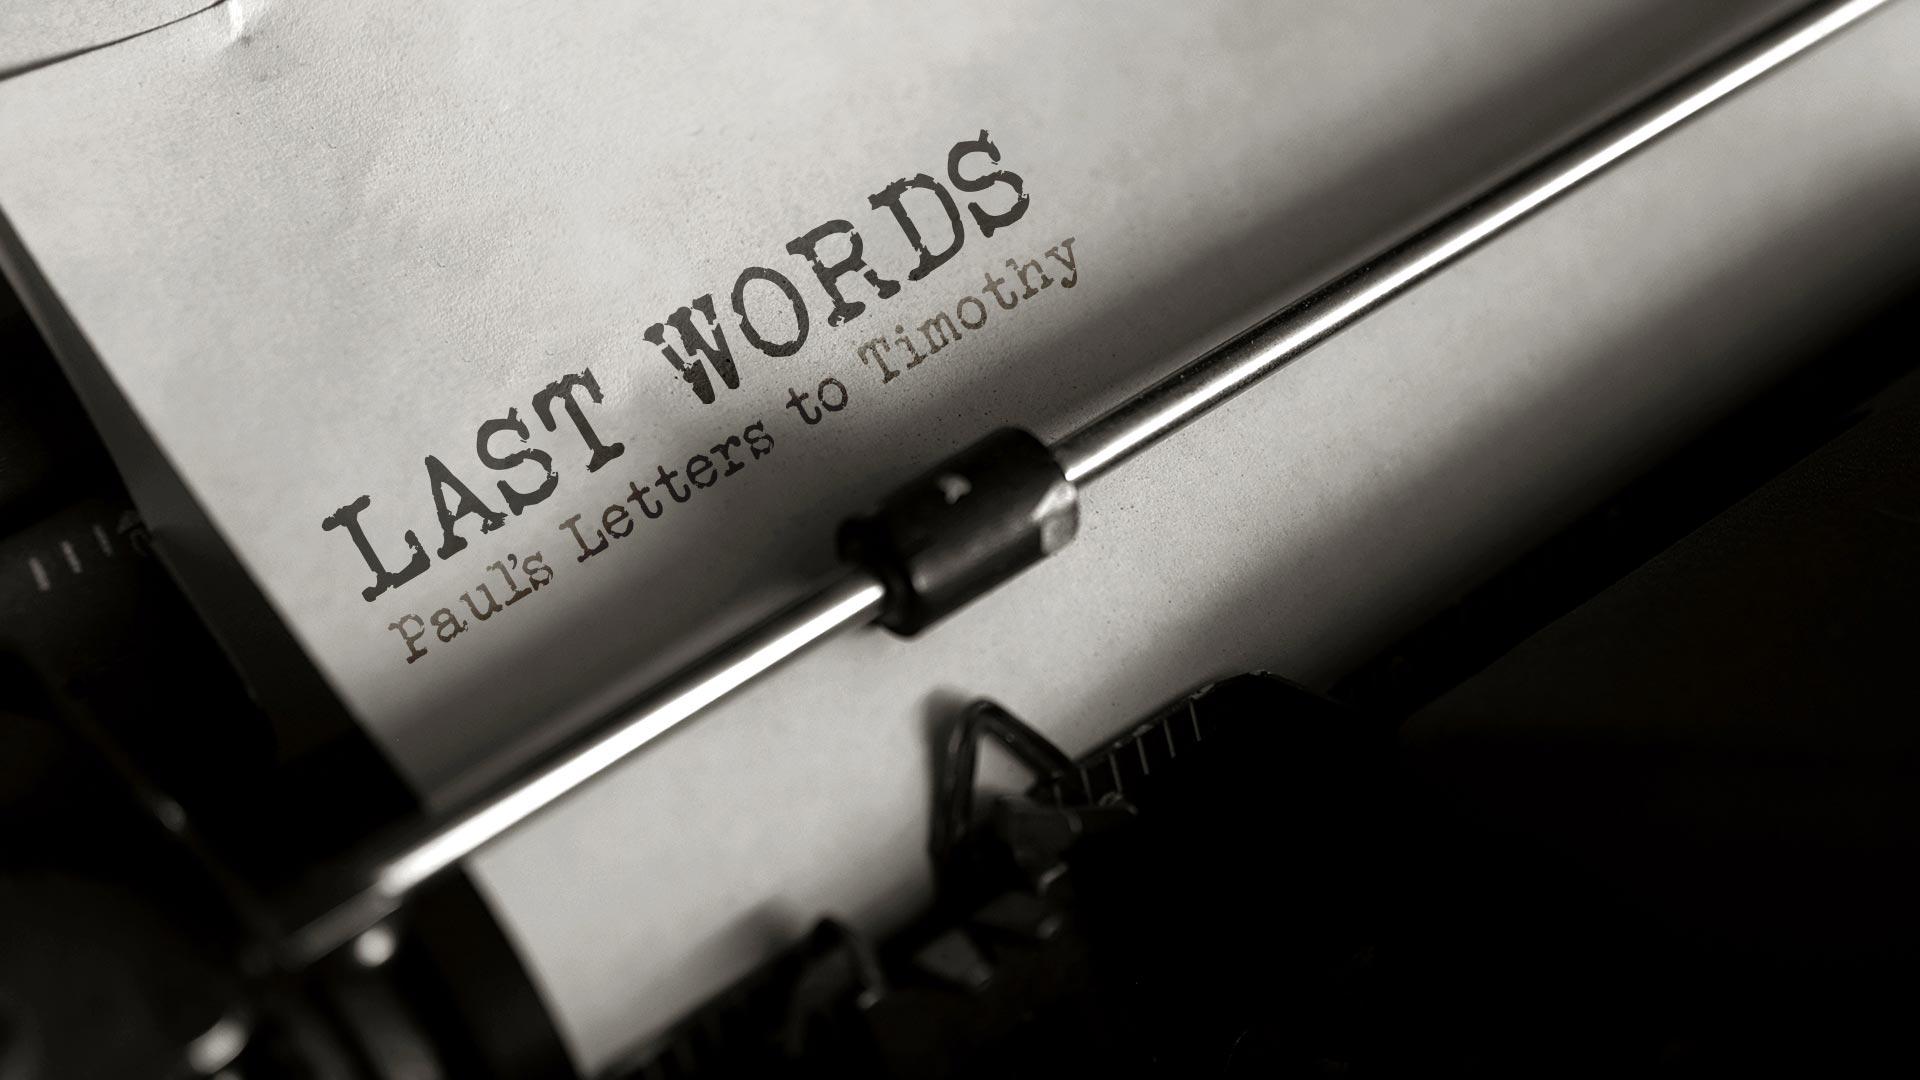 Last_Words_1920x1080.jpg